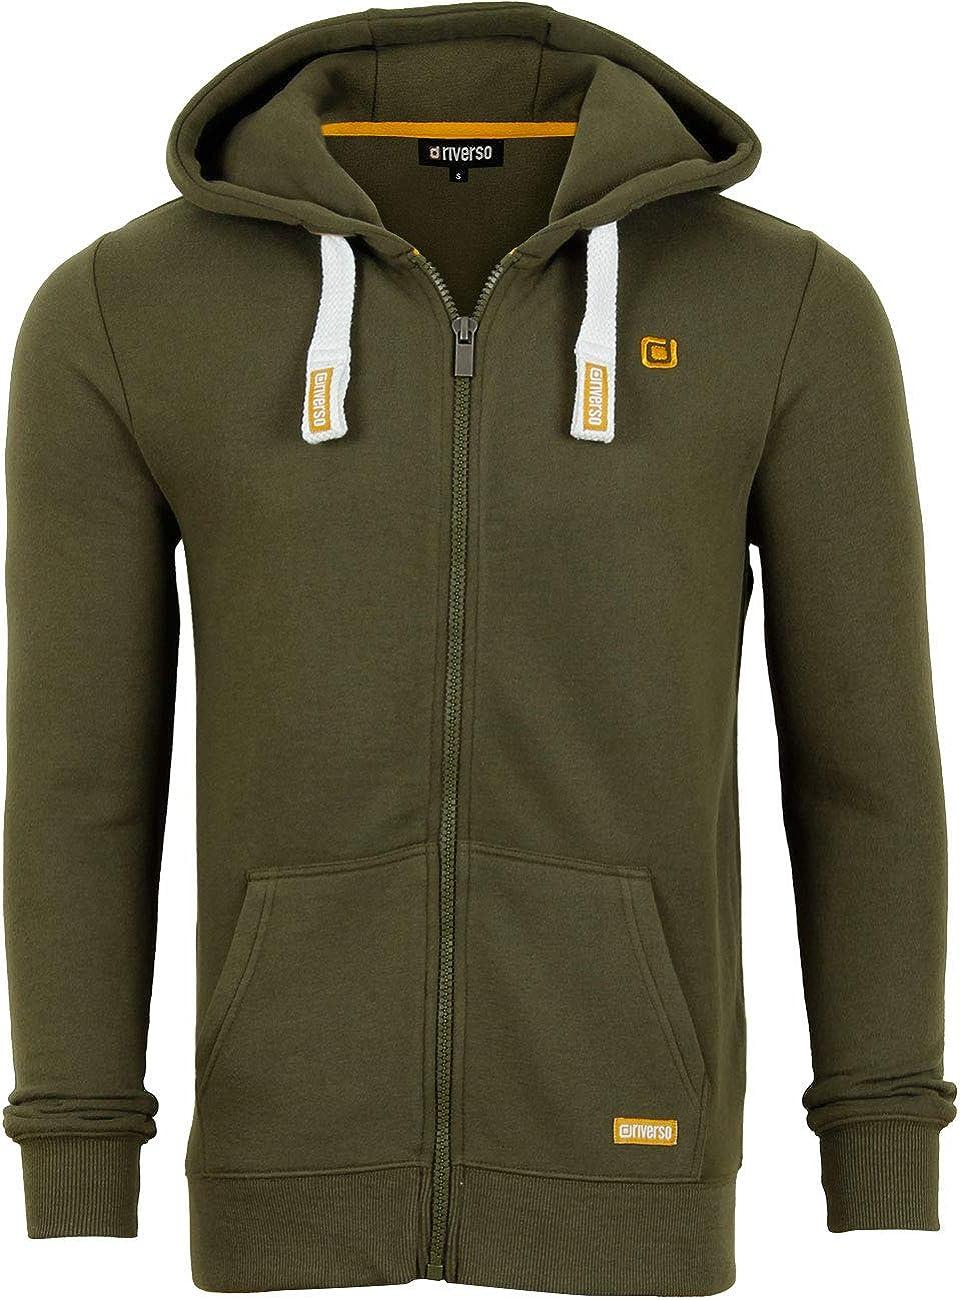 Black Plain 4XL Hoodie 5XL Green Sweat Jacket Red Basic Grey Sweatshirt XL M riverso Noah Mens Hooded Jacket Brown Blue with Zip L 2XL Cotton S 3XL